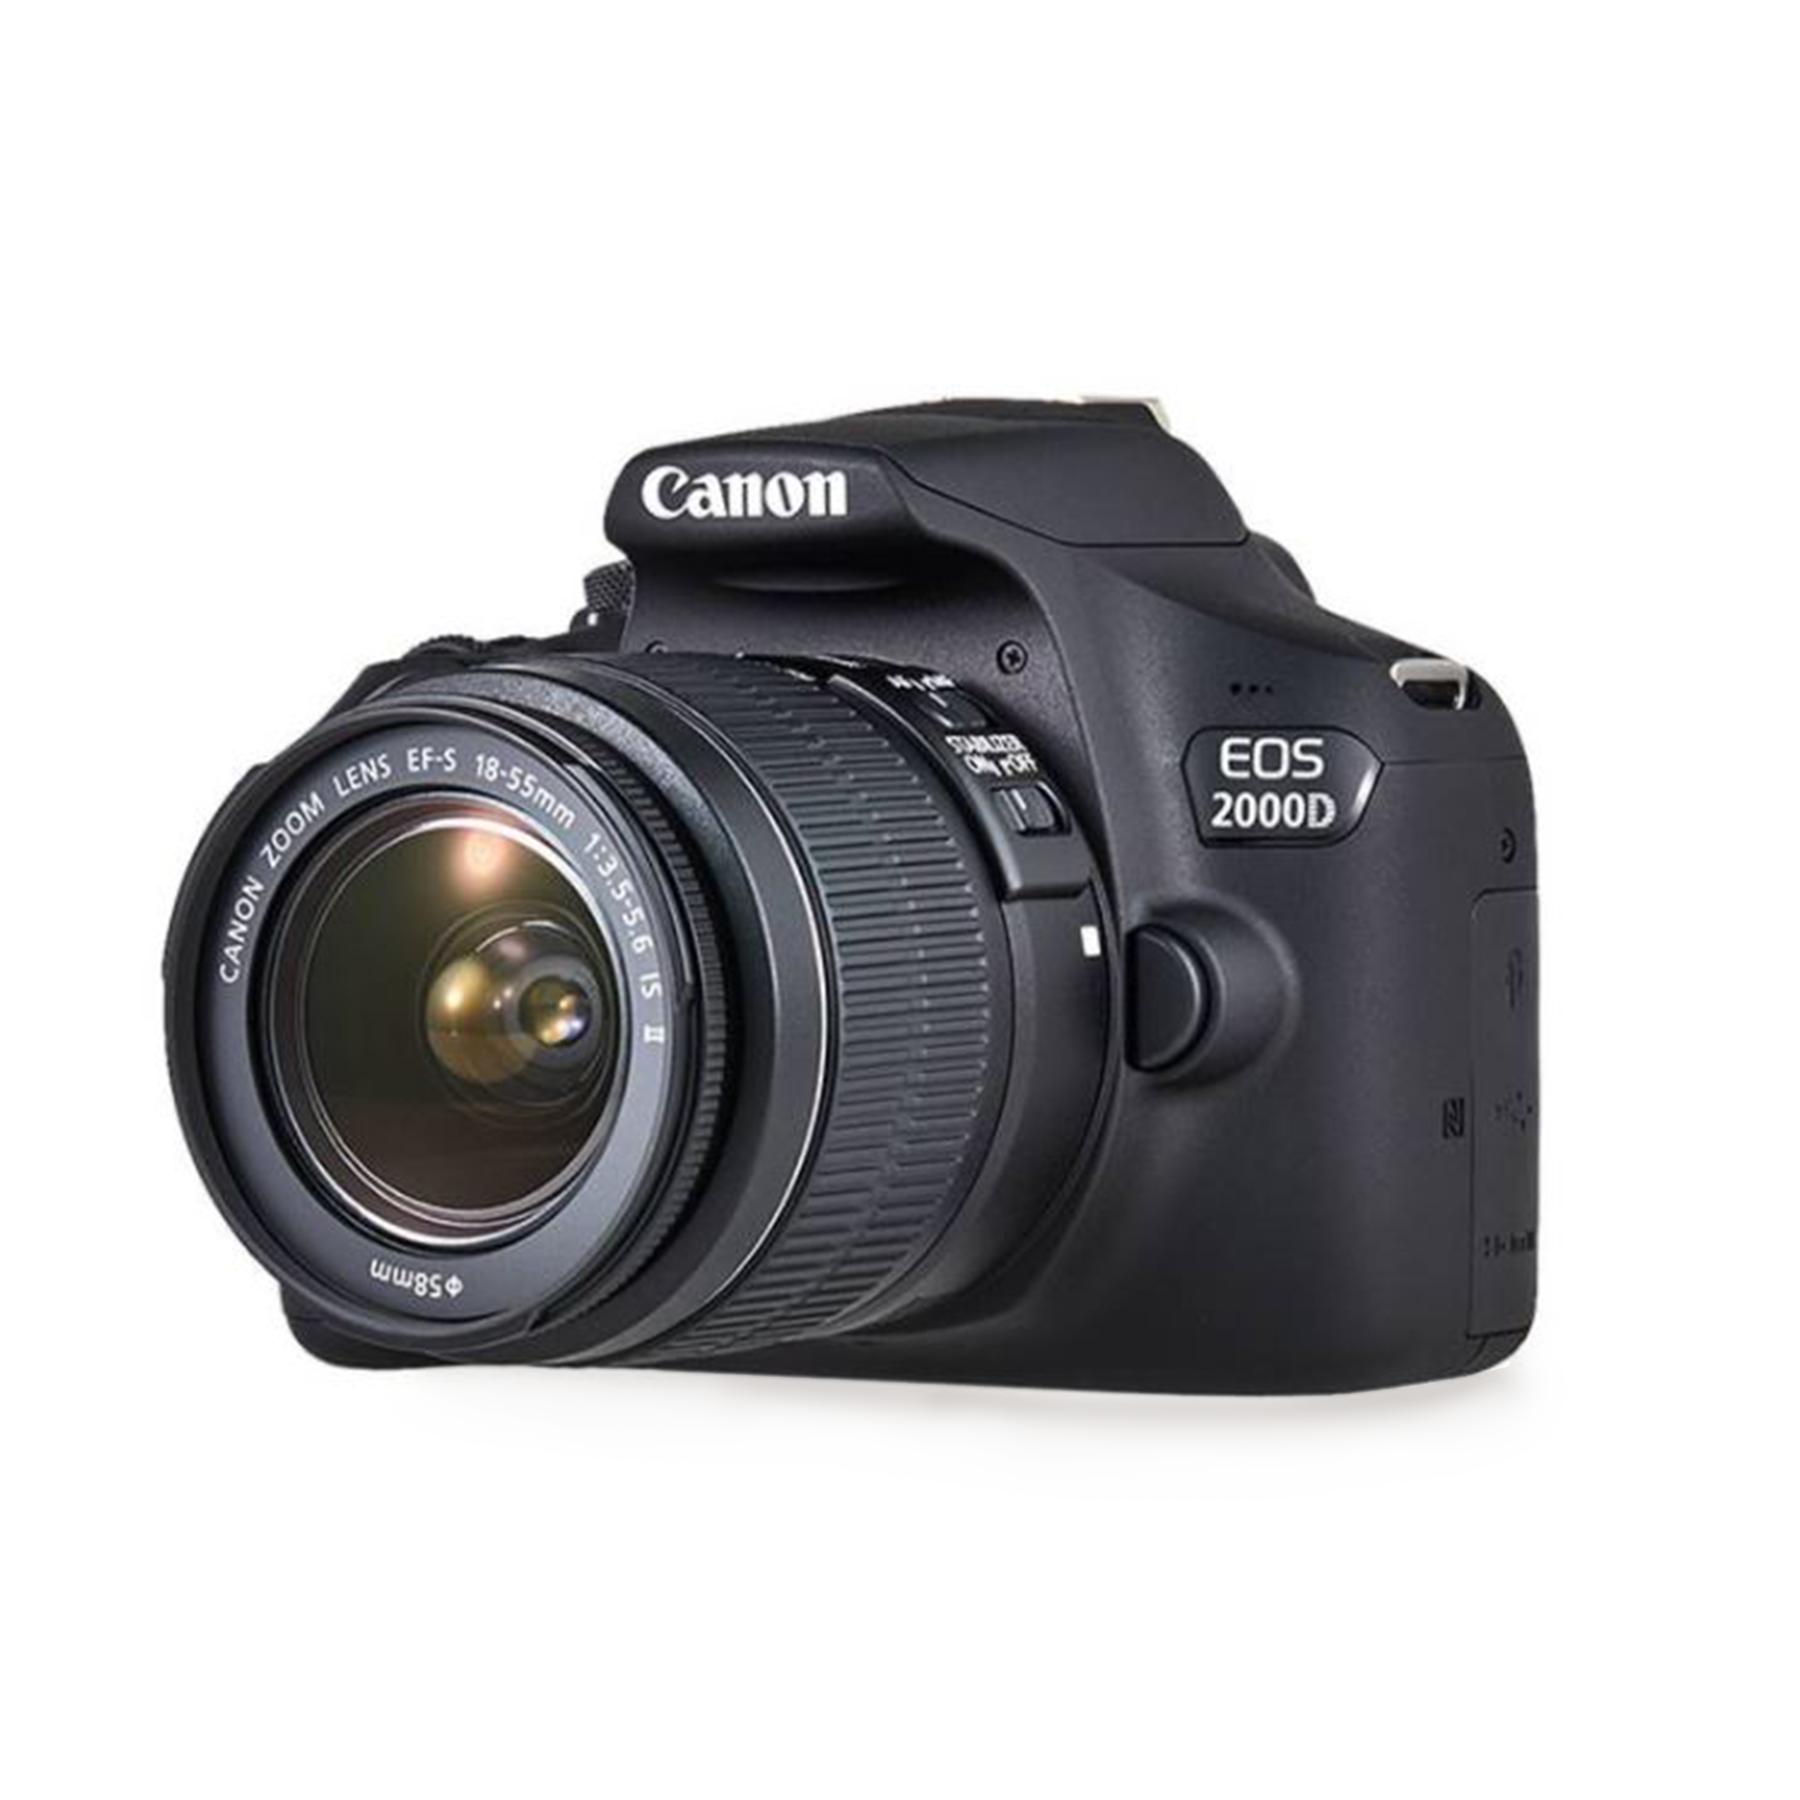 Canon EOS 2000D (Rebel T7) DSLR Camera